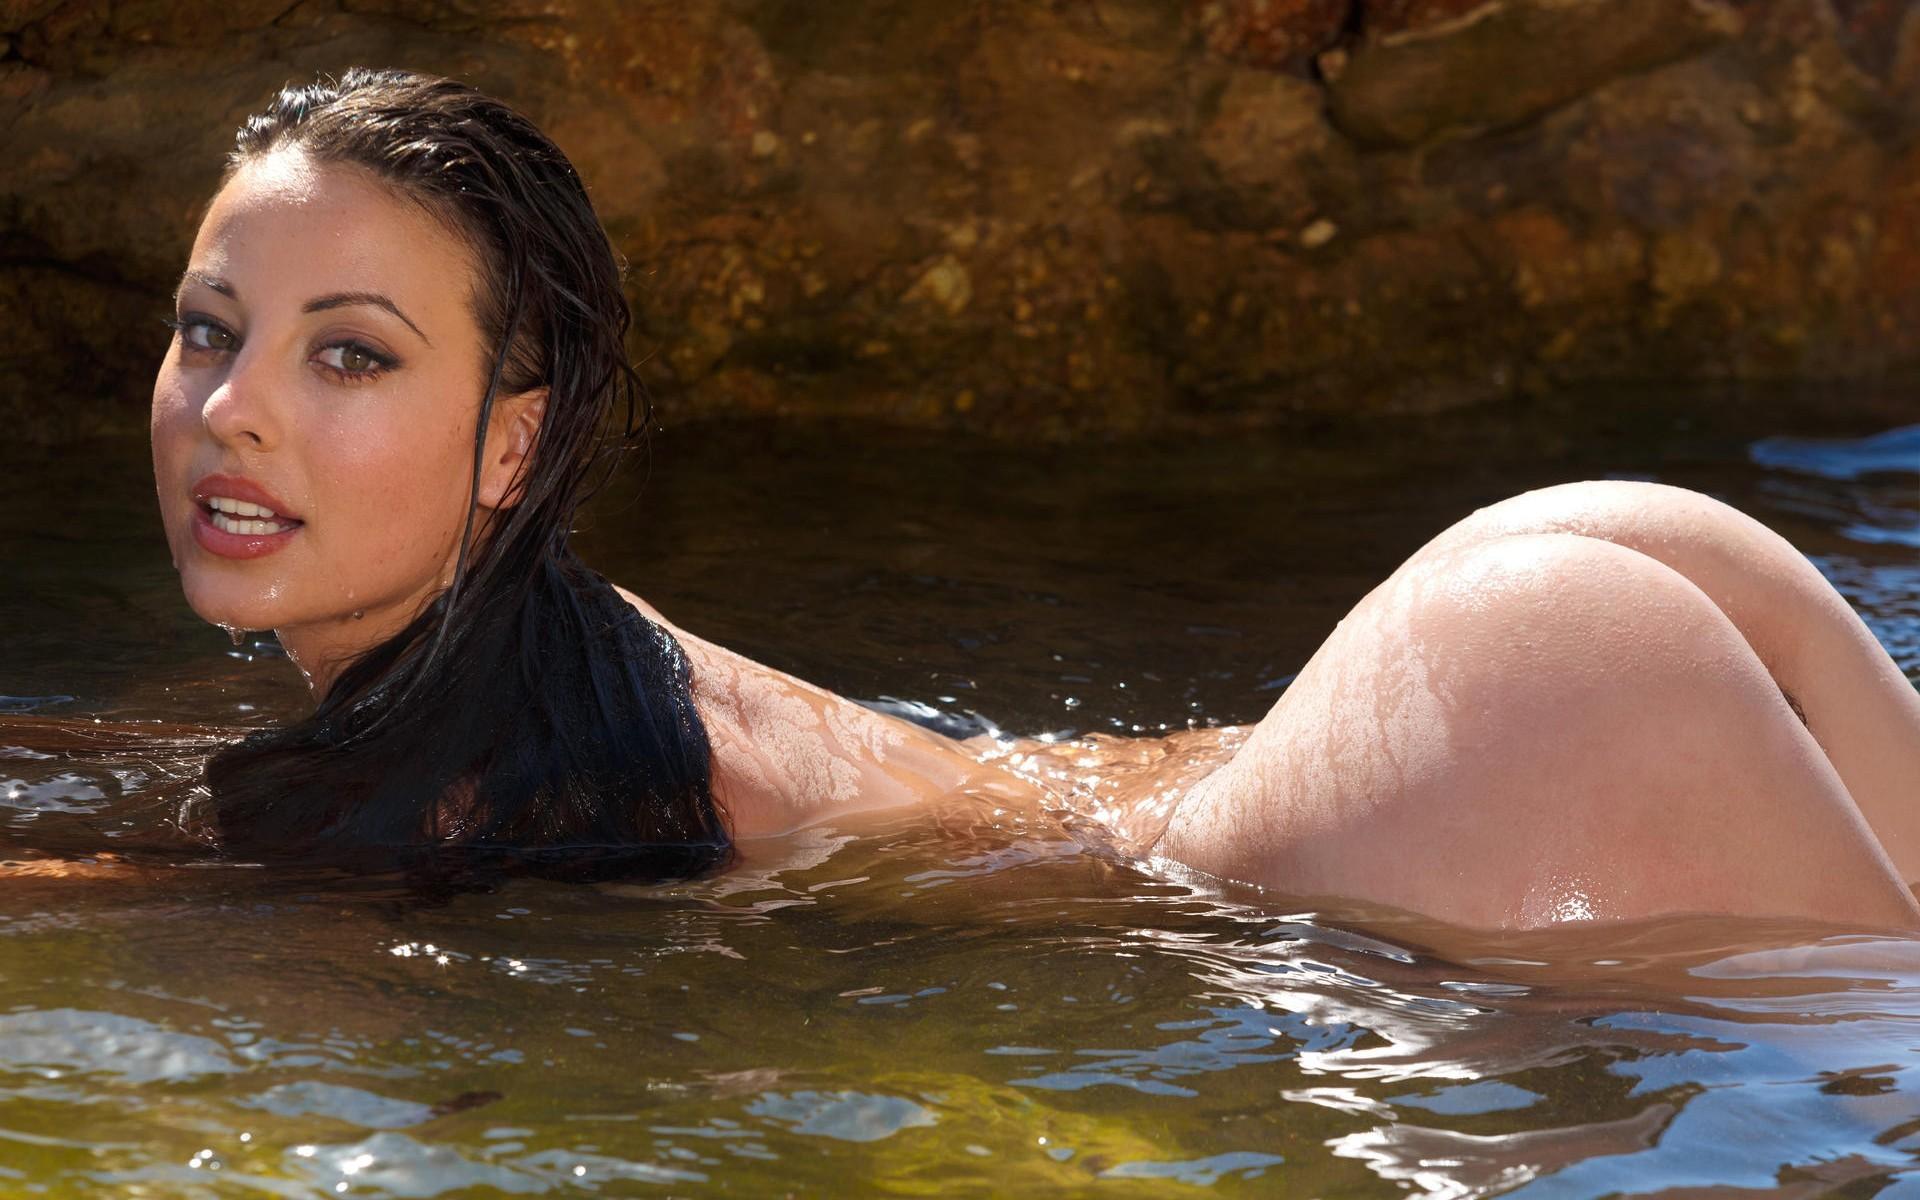 Wallpaper  Sunlight, Model, Water, Dark Hair, Bathing -8147